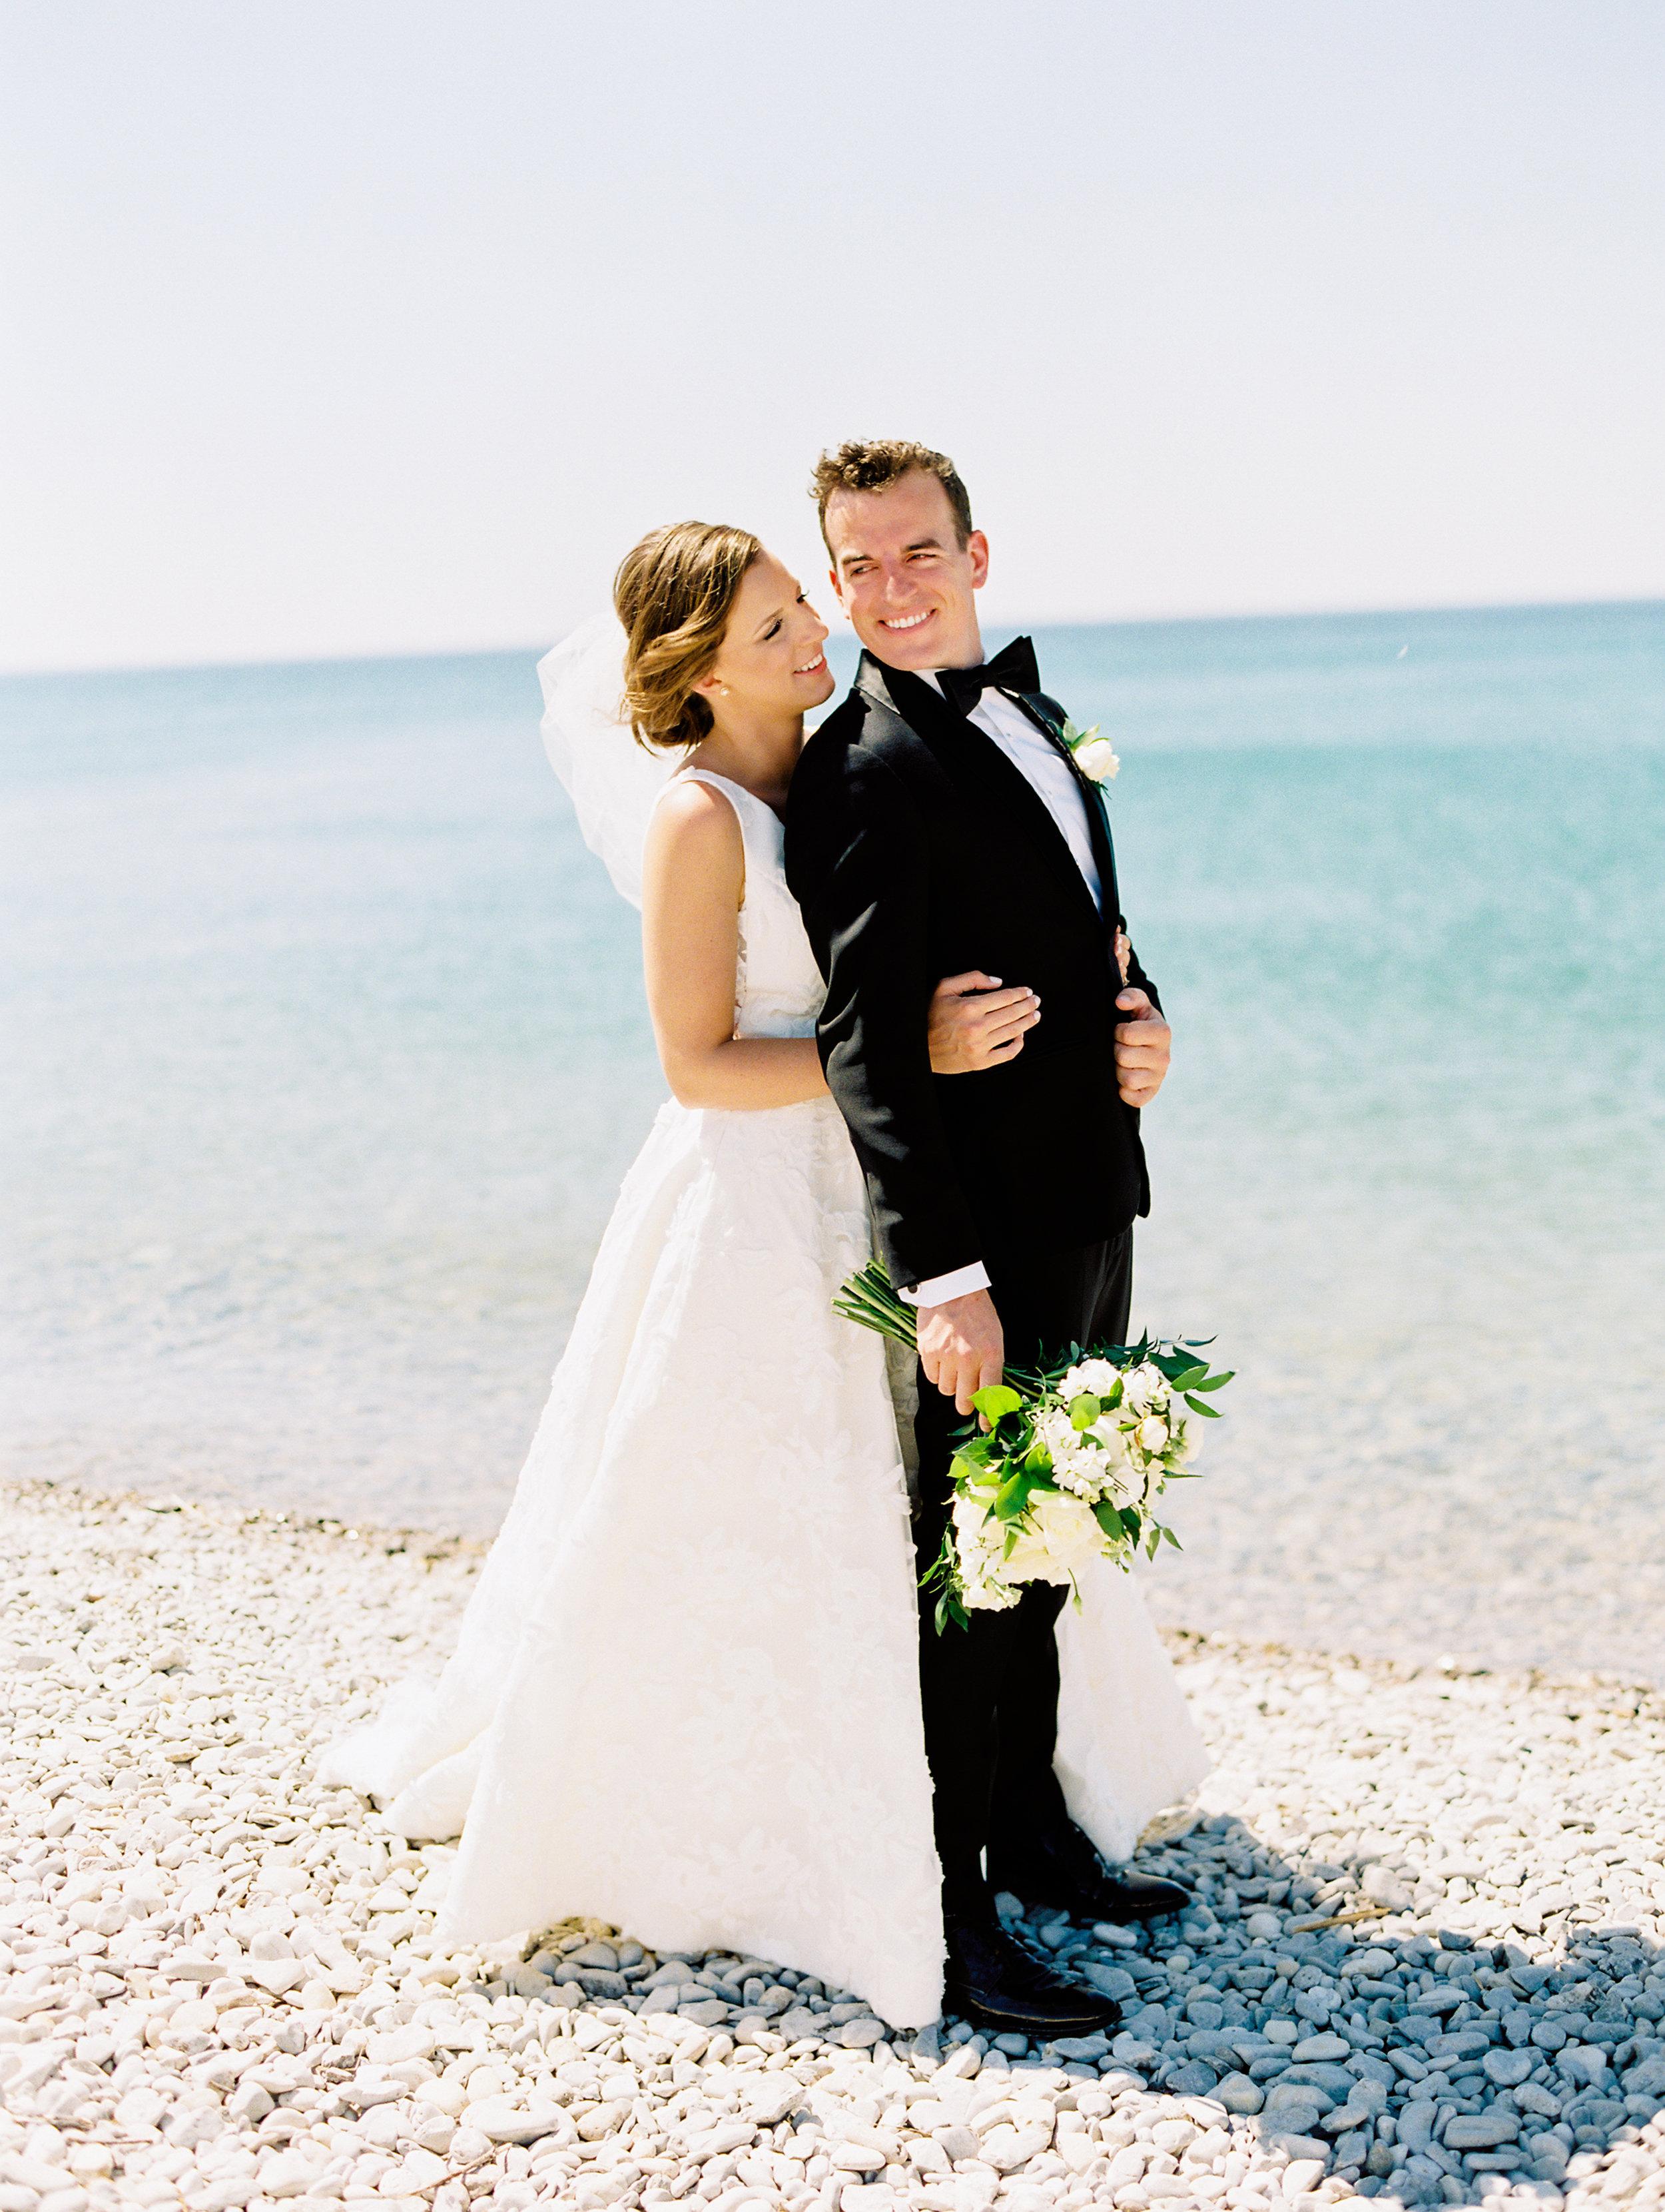 DeGuilio+Wedding+Bridal+Partyf-9.jpg